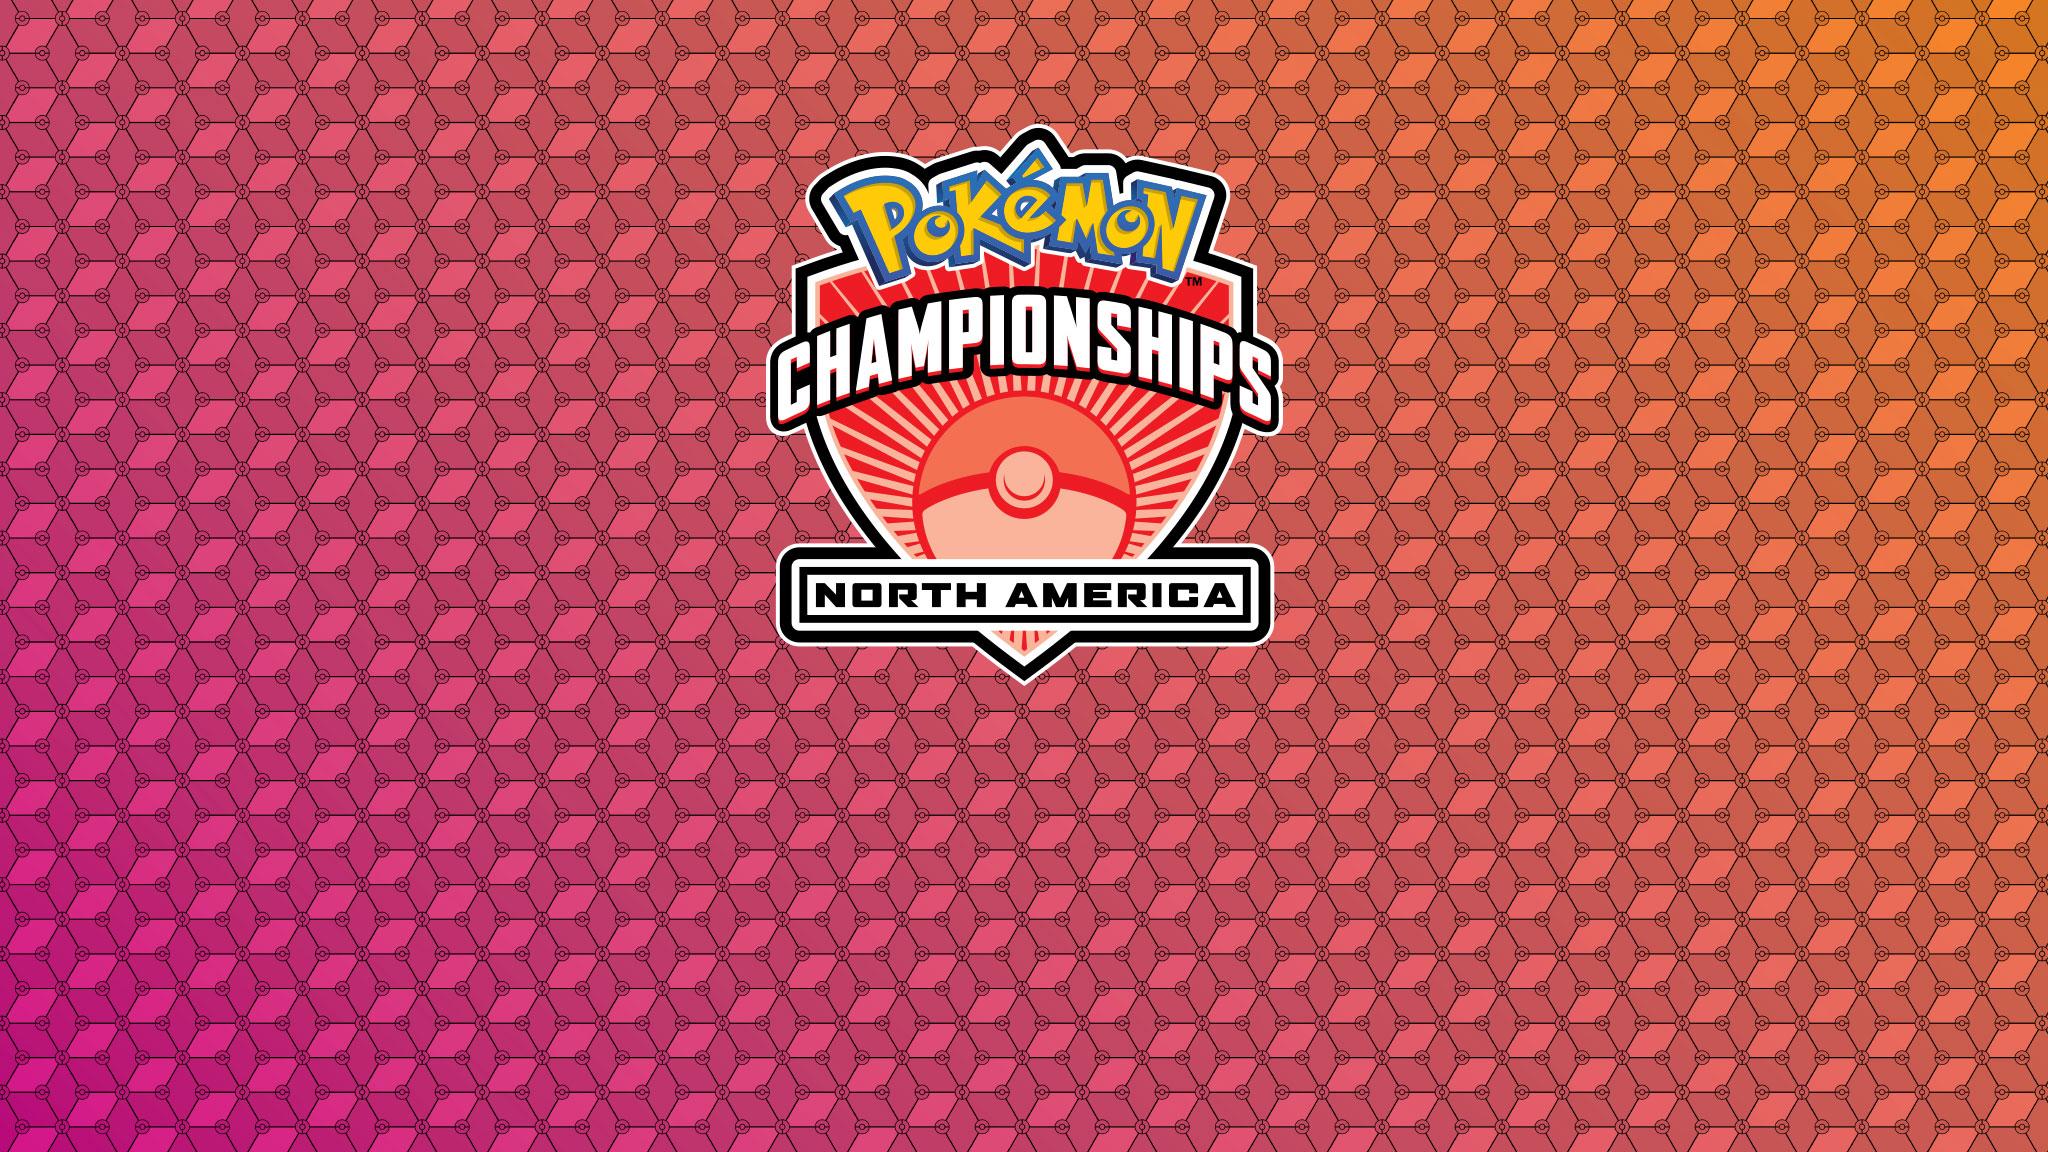 2019 Pokémon North America International Championships on FREECABLE TV